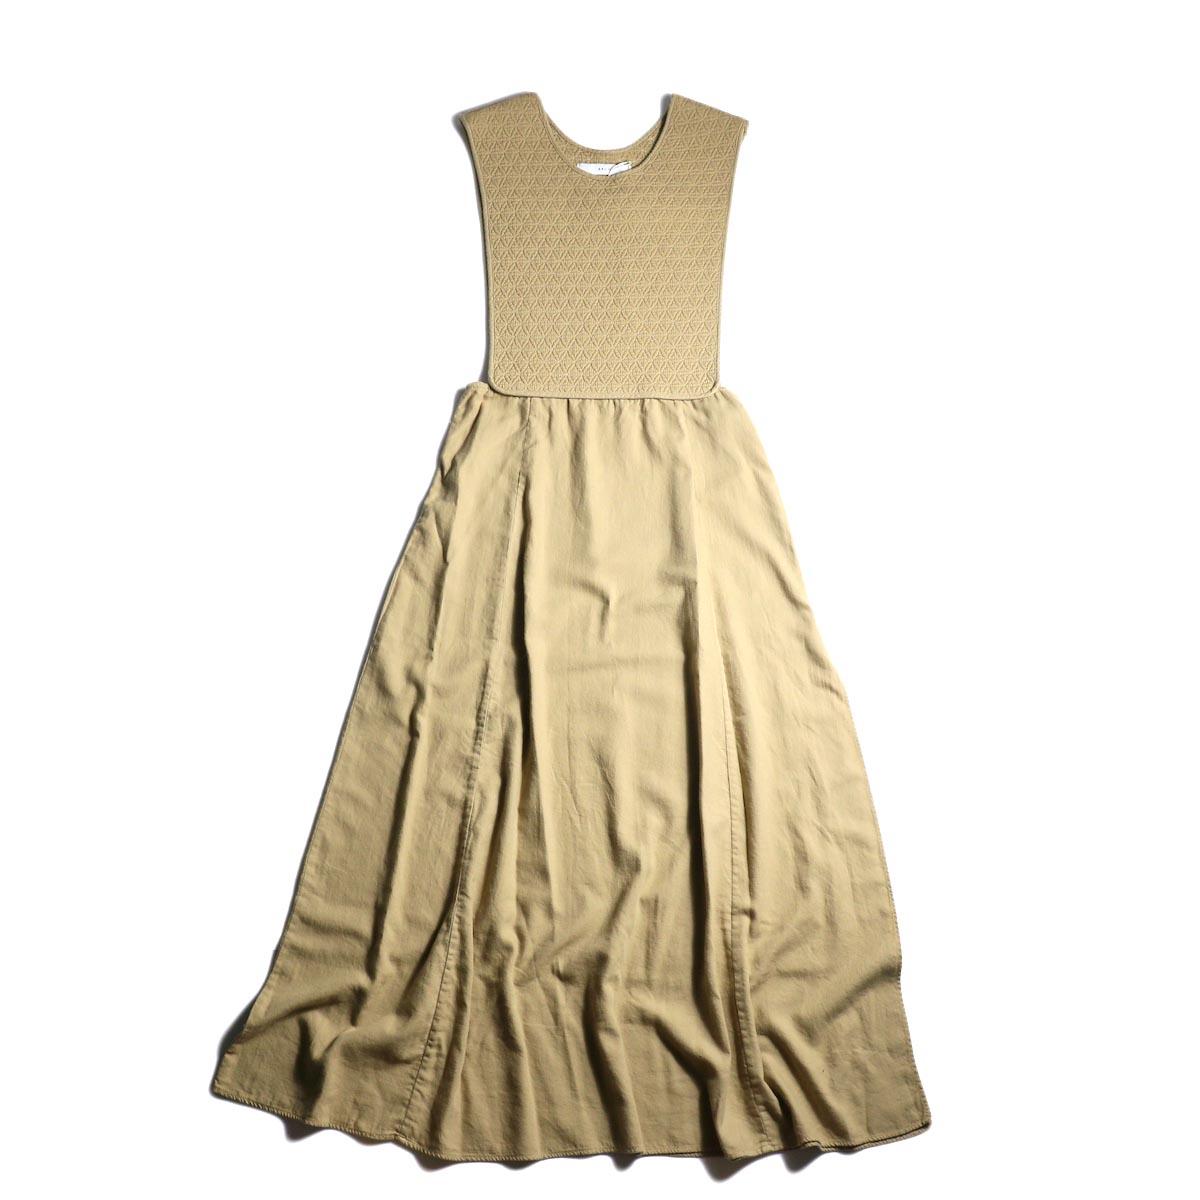 ARCHI / SKIMIA QUILT DRESS (beige)